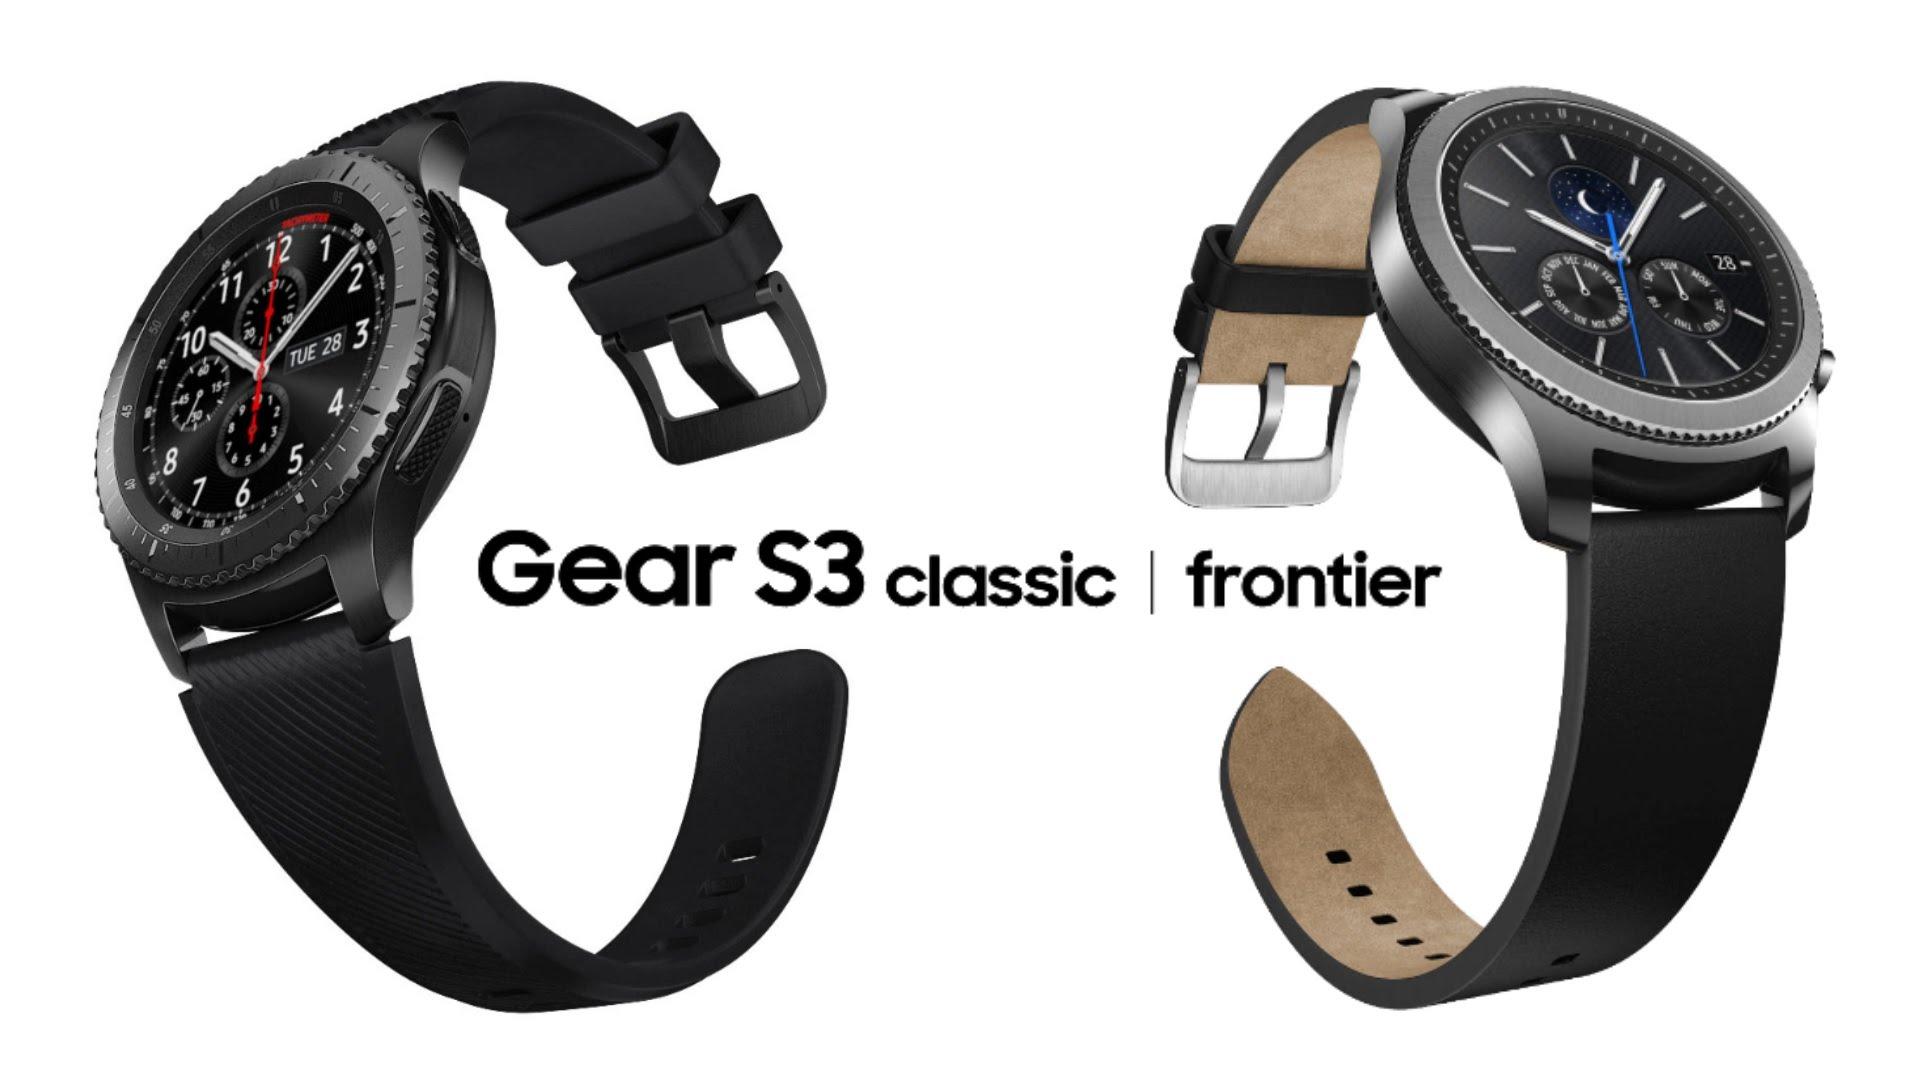 samsung gear s3 frontier vs classic